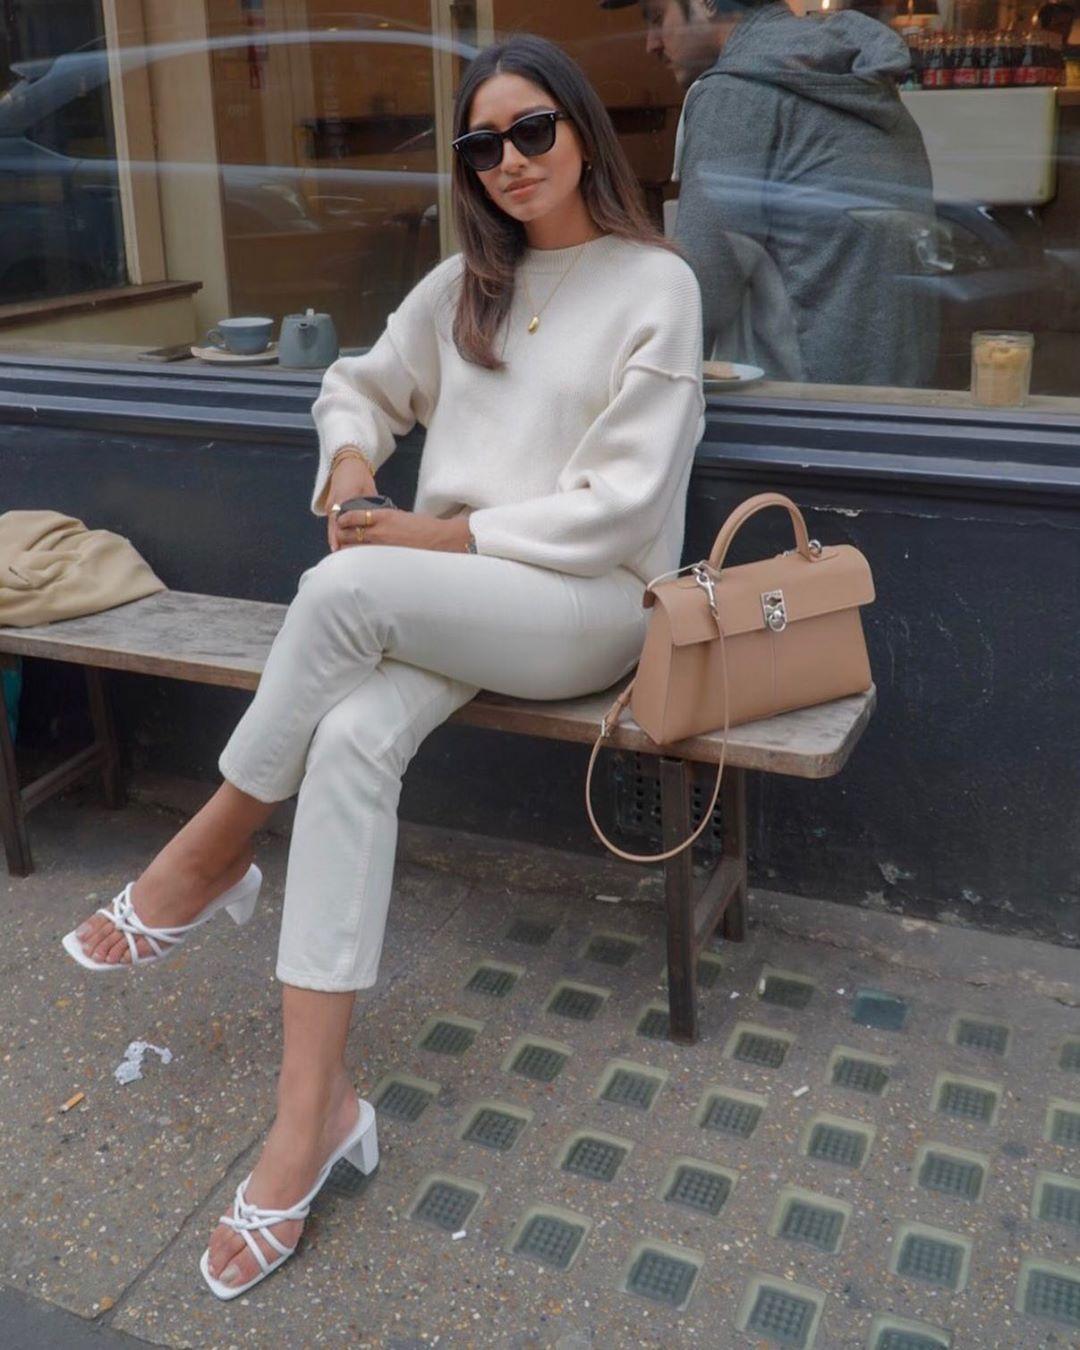 21 4k Vind Ik Leuks 166 Reacties Hannah Cocobeautea Cocobeautea Op Instagram Almost Wh High Fashion Street Style Fashion Street Fashion Photography